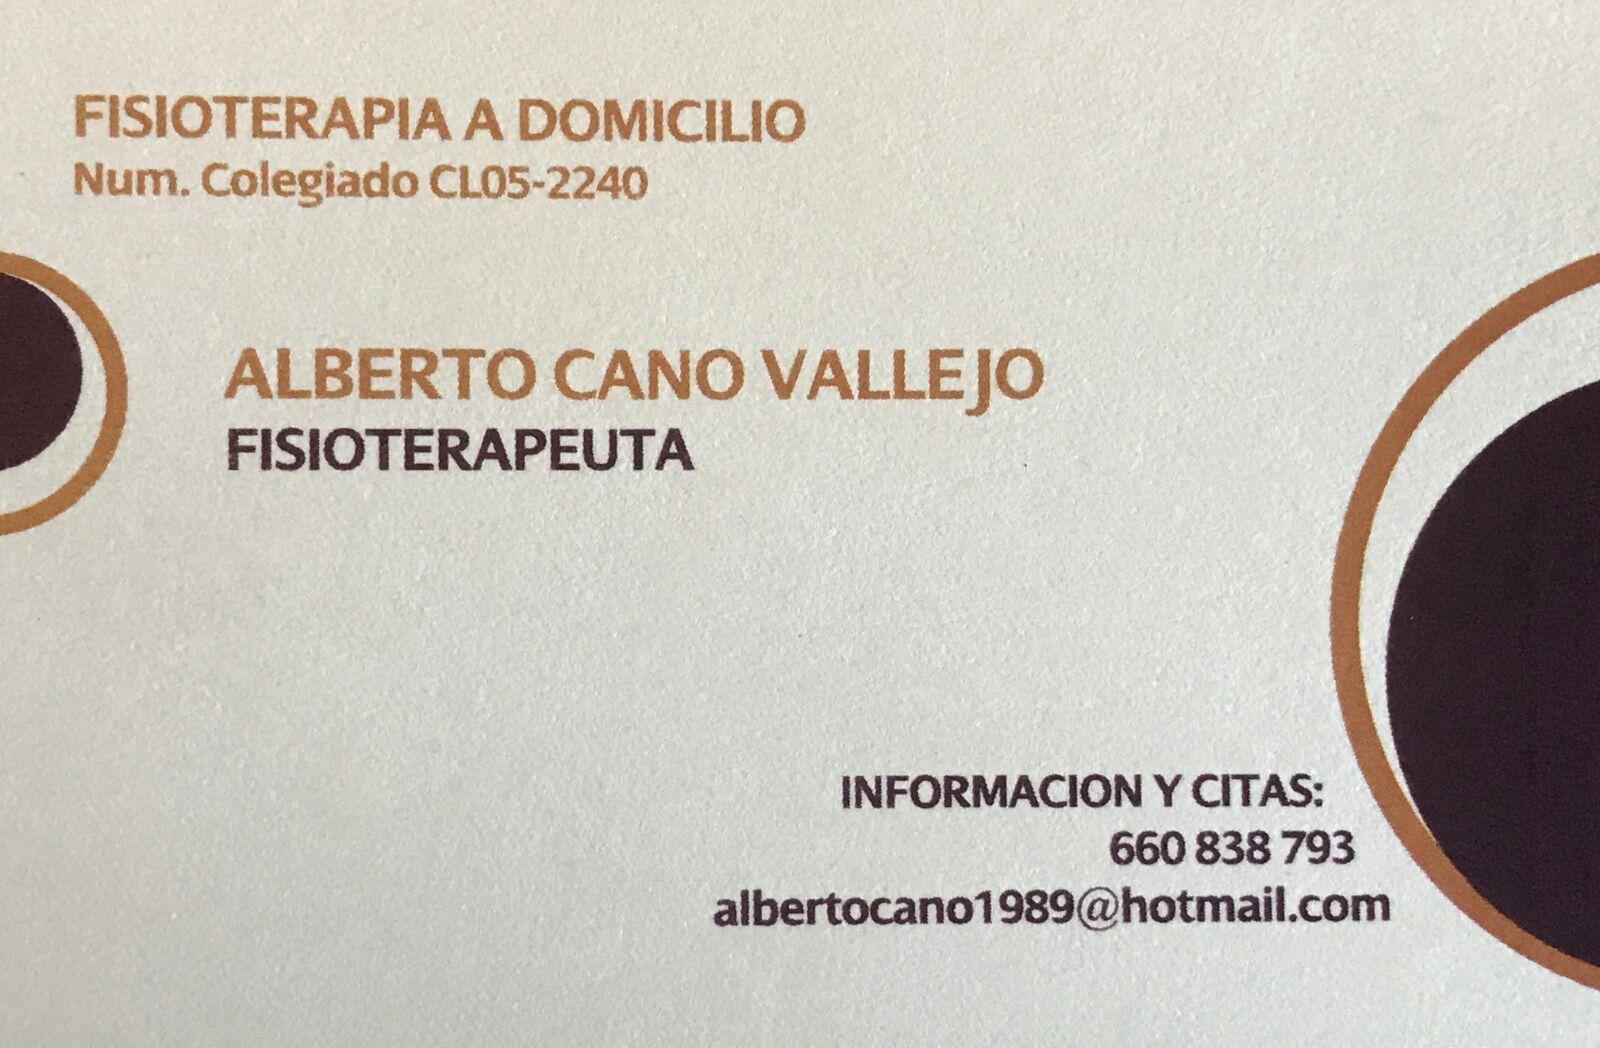 Alberto Cano Vallejo